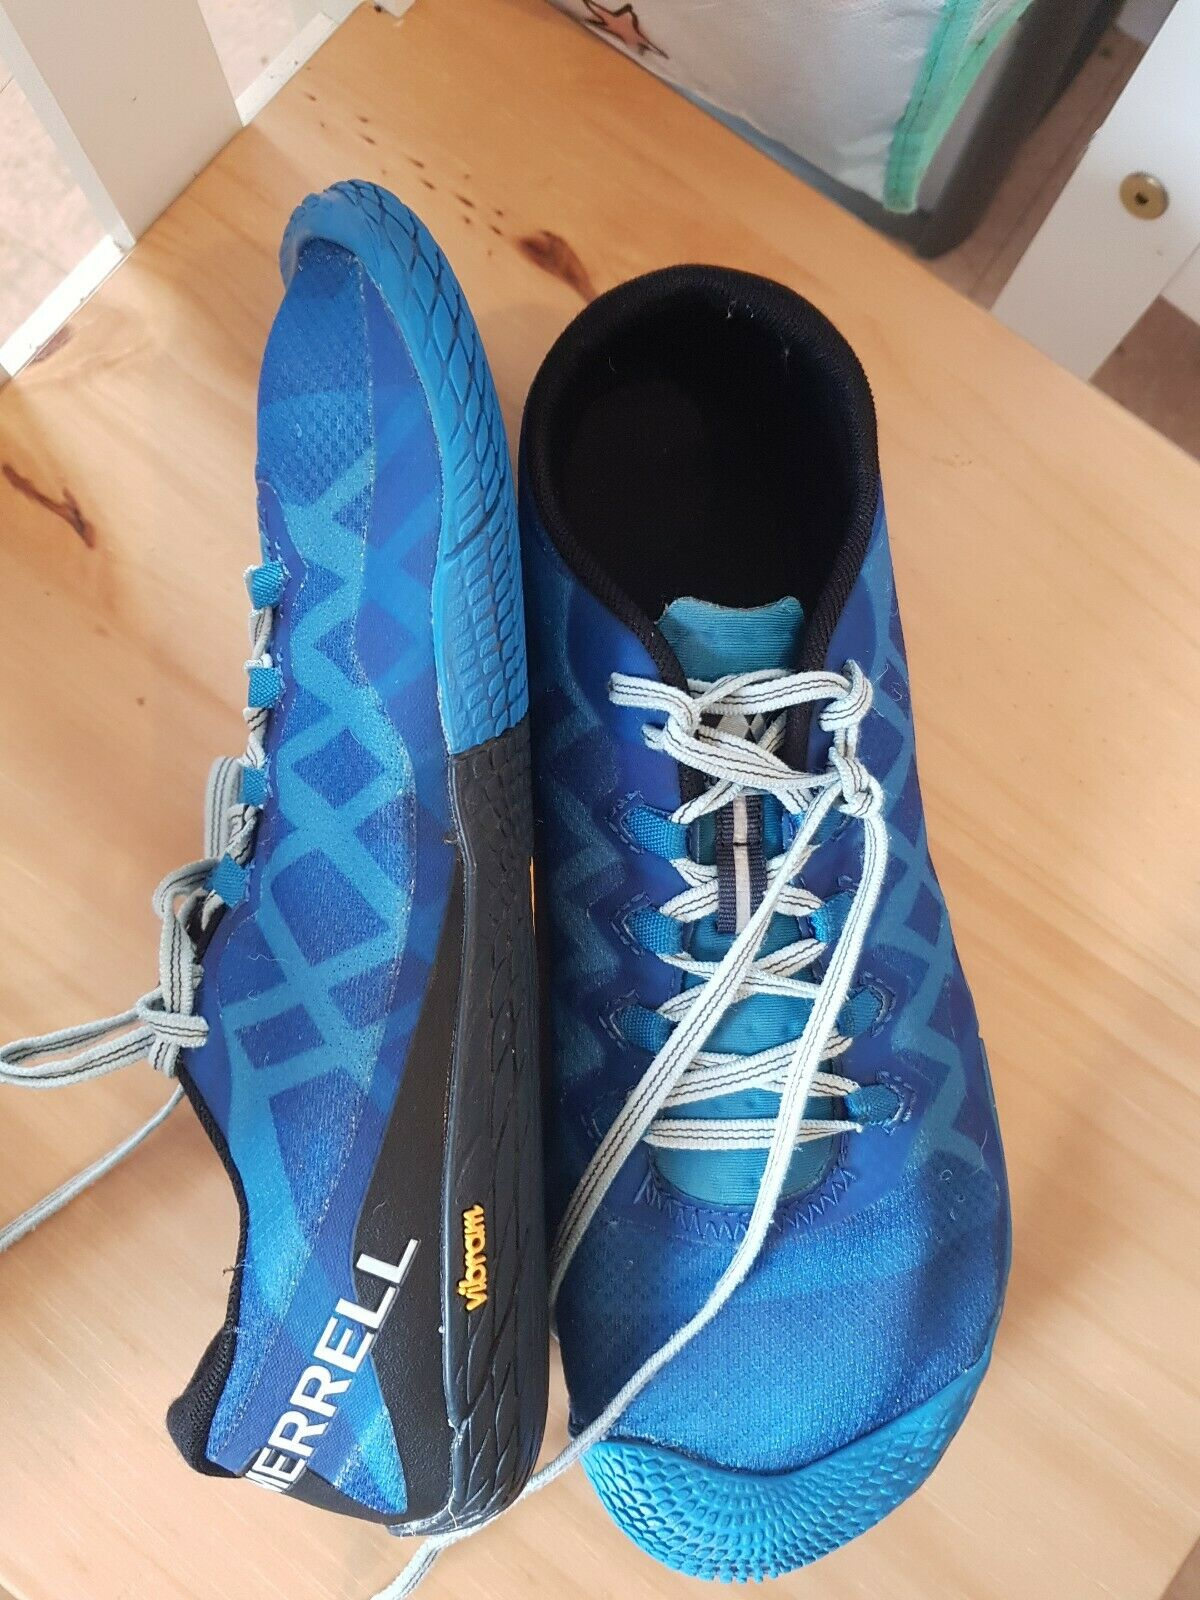 MERRELL Vapor Glove 3 Blue Trainers Shoes Mens Uk 8.5 (EU 43)